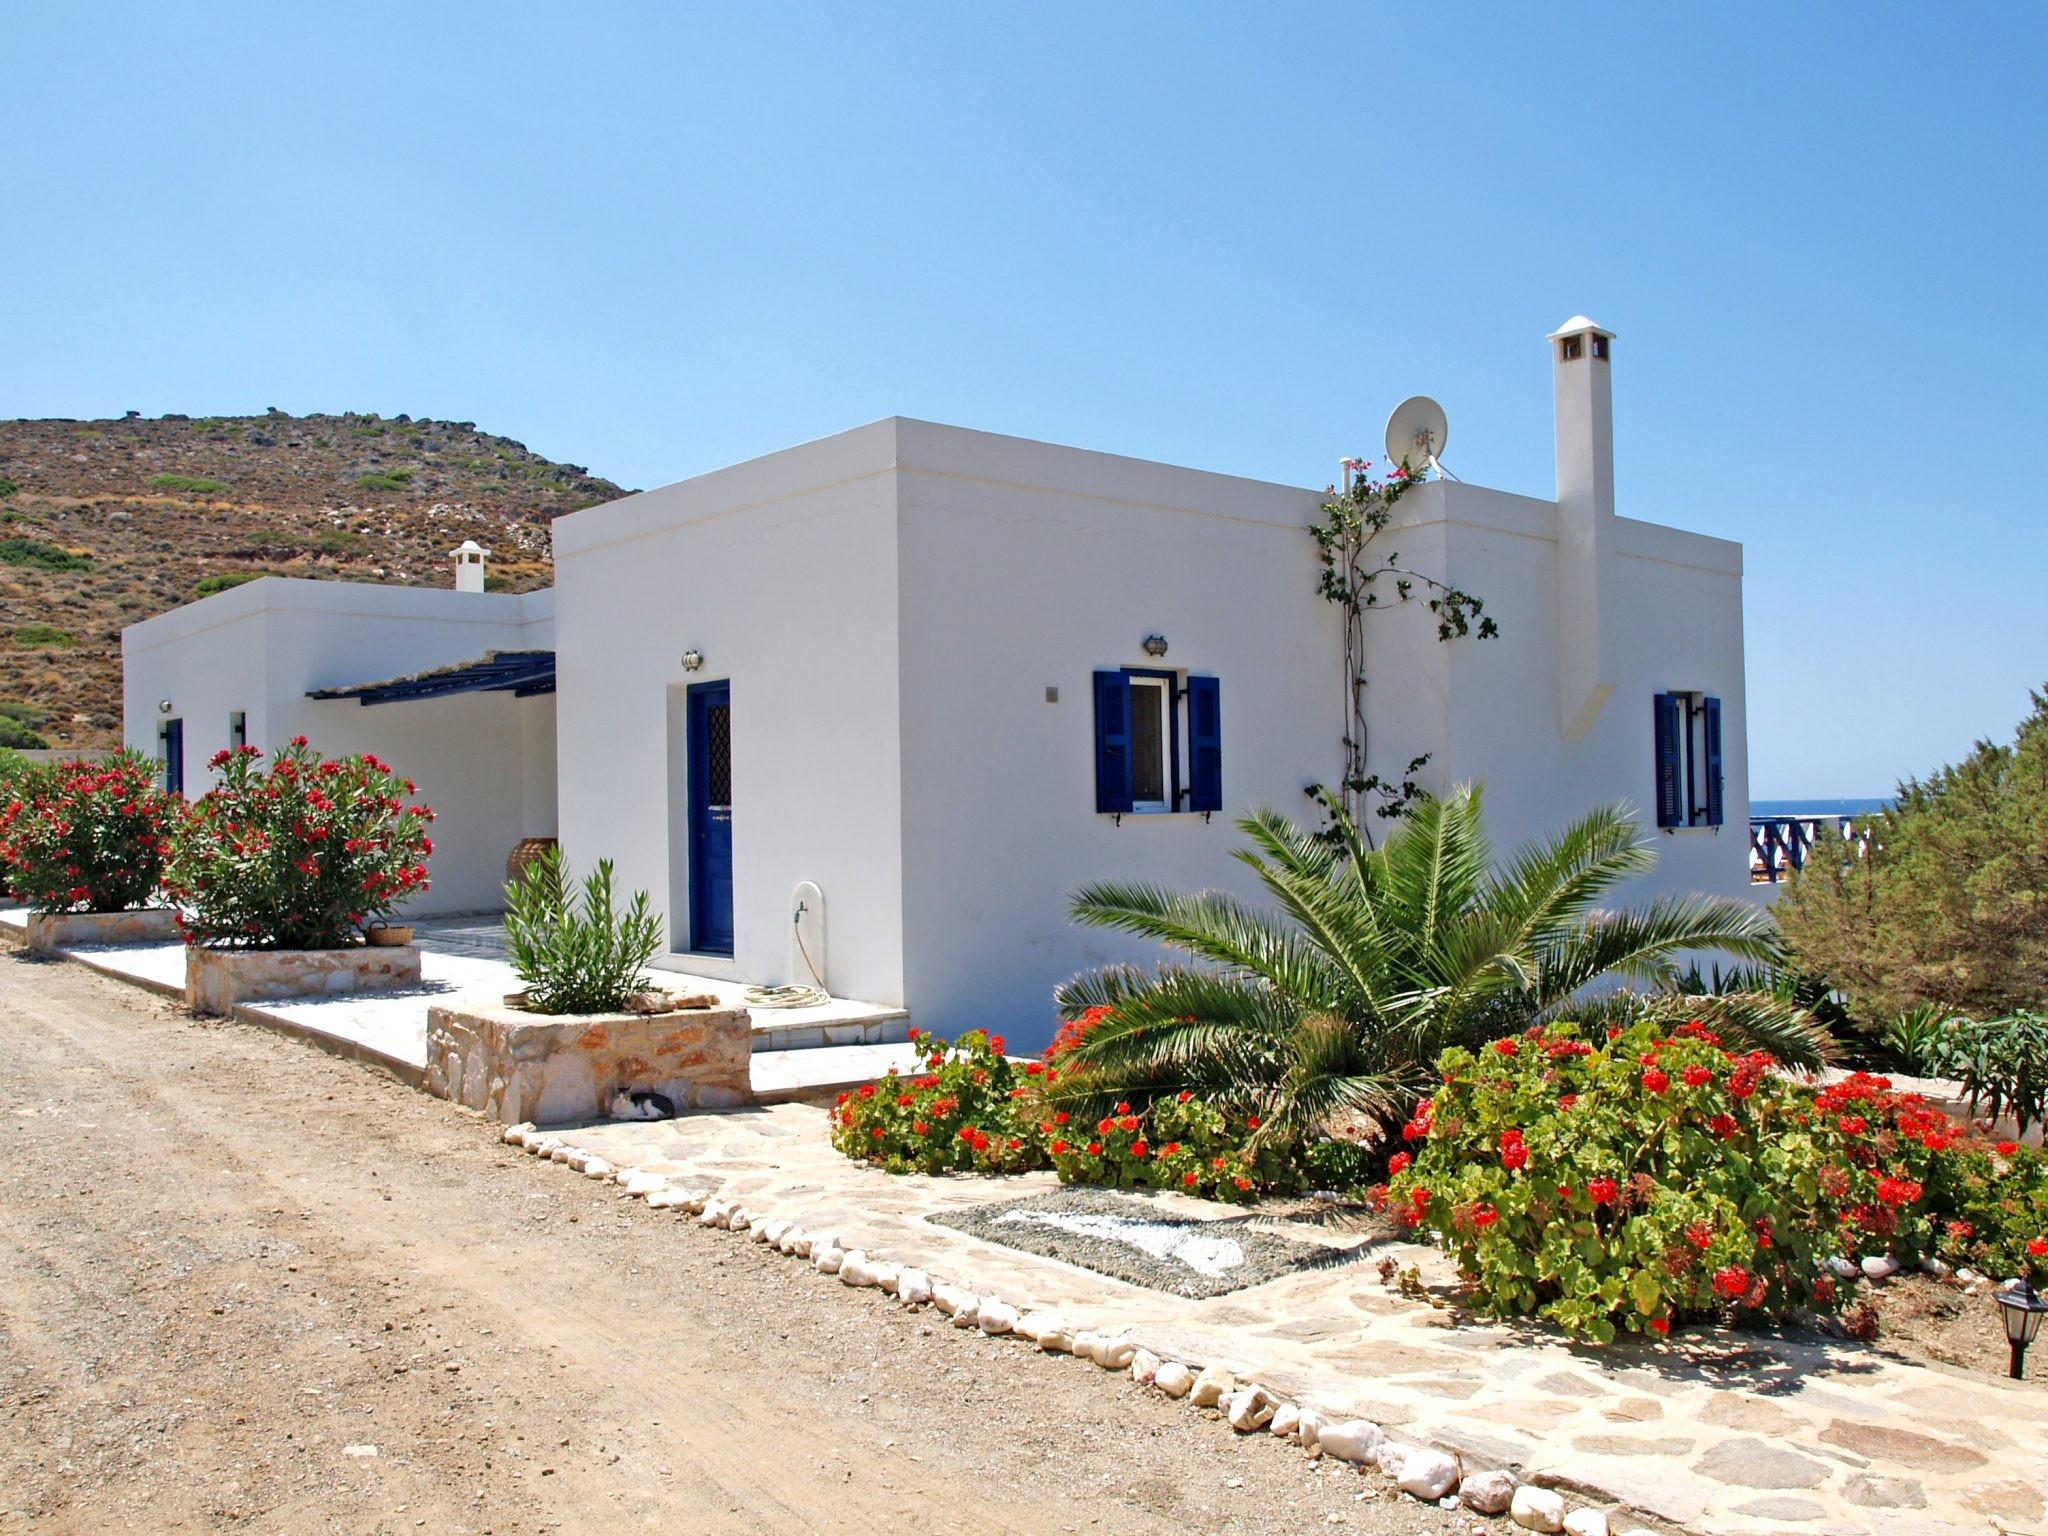 Maison, Syros - Ref GR-1463-S